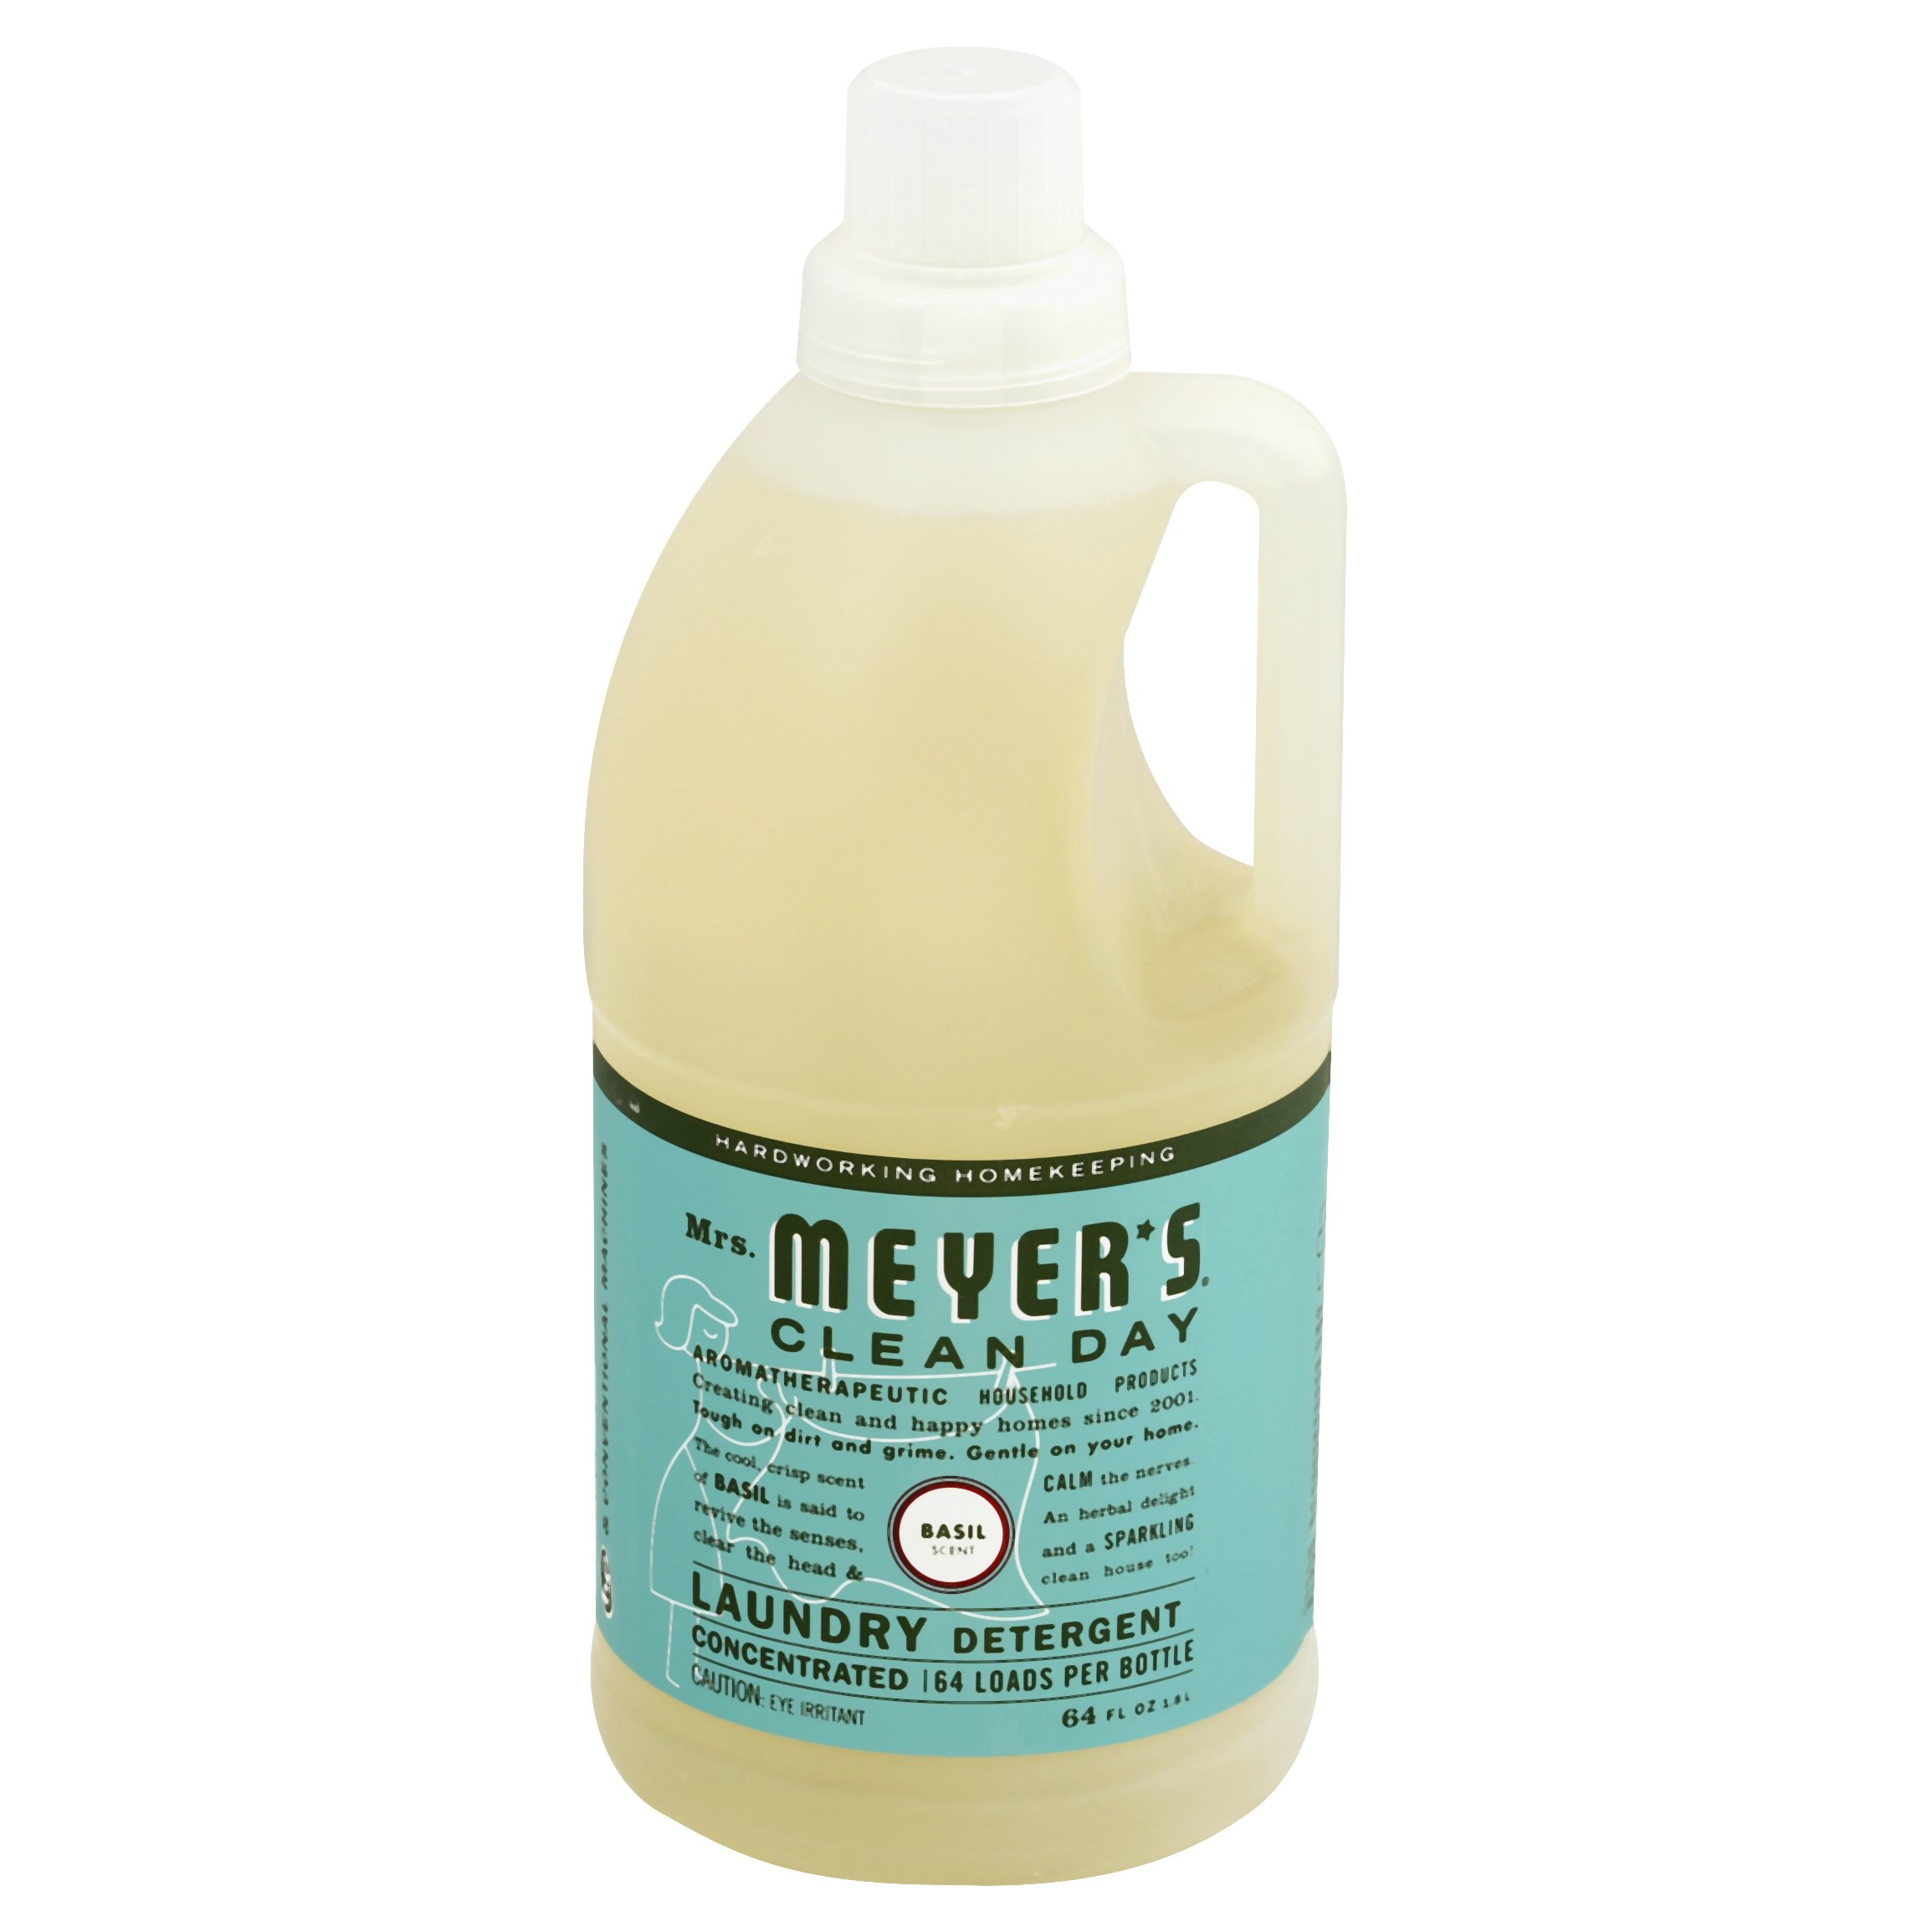 Mrs. Meyers Basil Laundry Detergent 64OZ 6-Pack